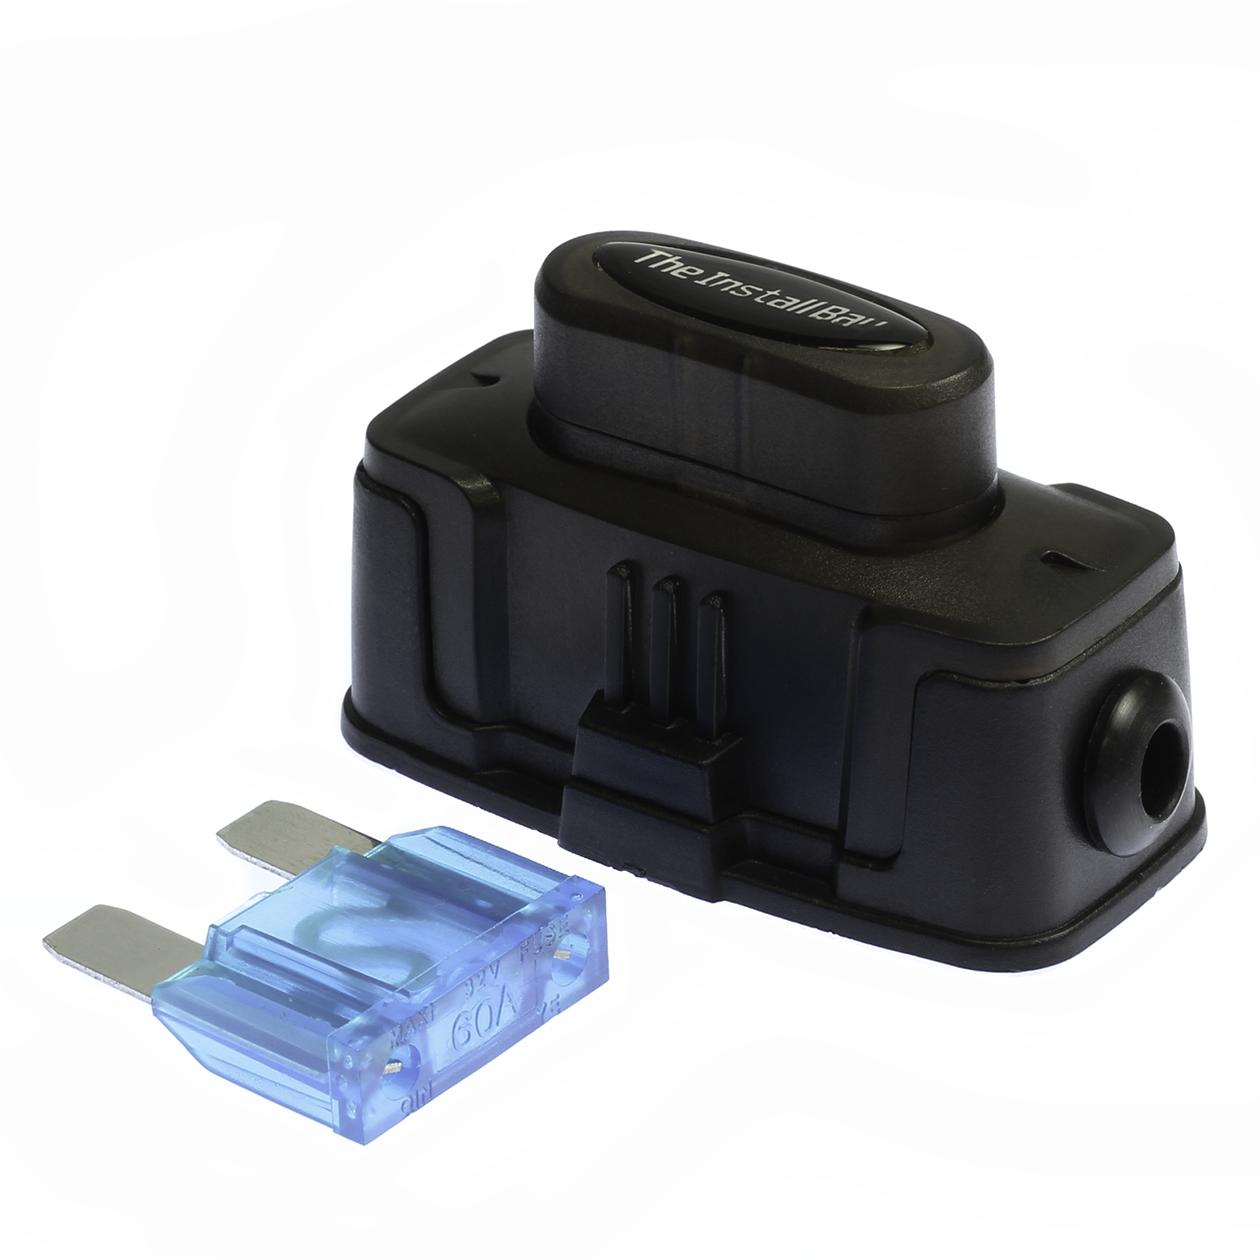 Maxi Fuse 60a Box Inline Holder Fuseholder Install Bay Gauge Amp 1260x1260